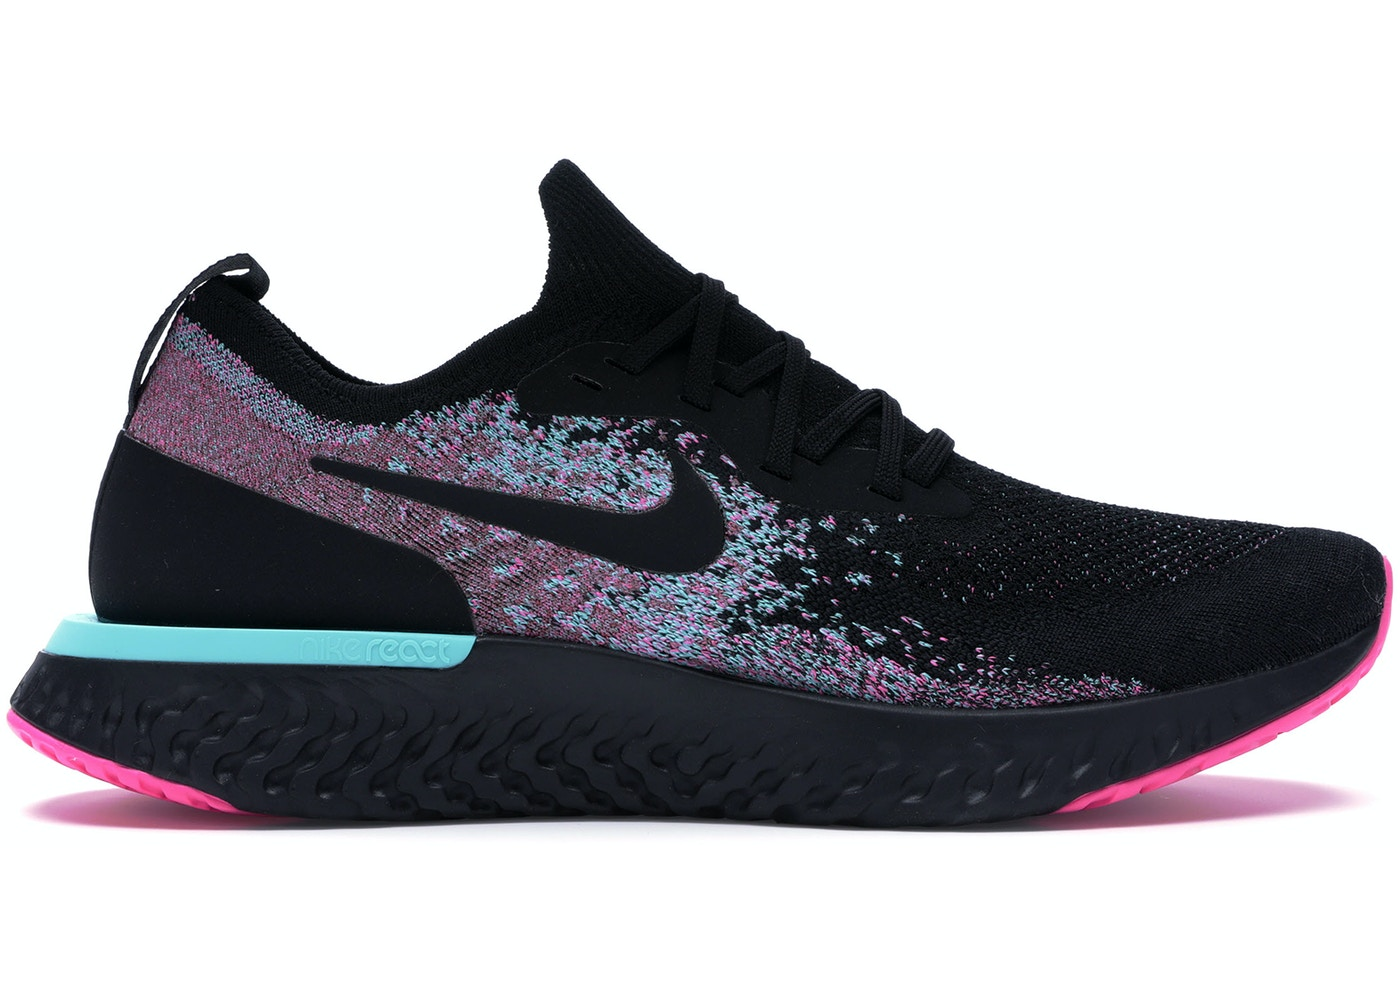 new product d175d d1e7e Nike Epic React Flyknit South Beach